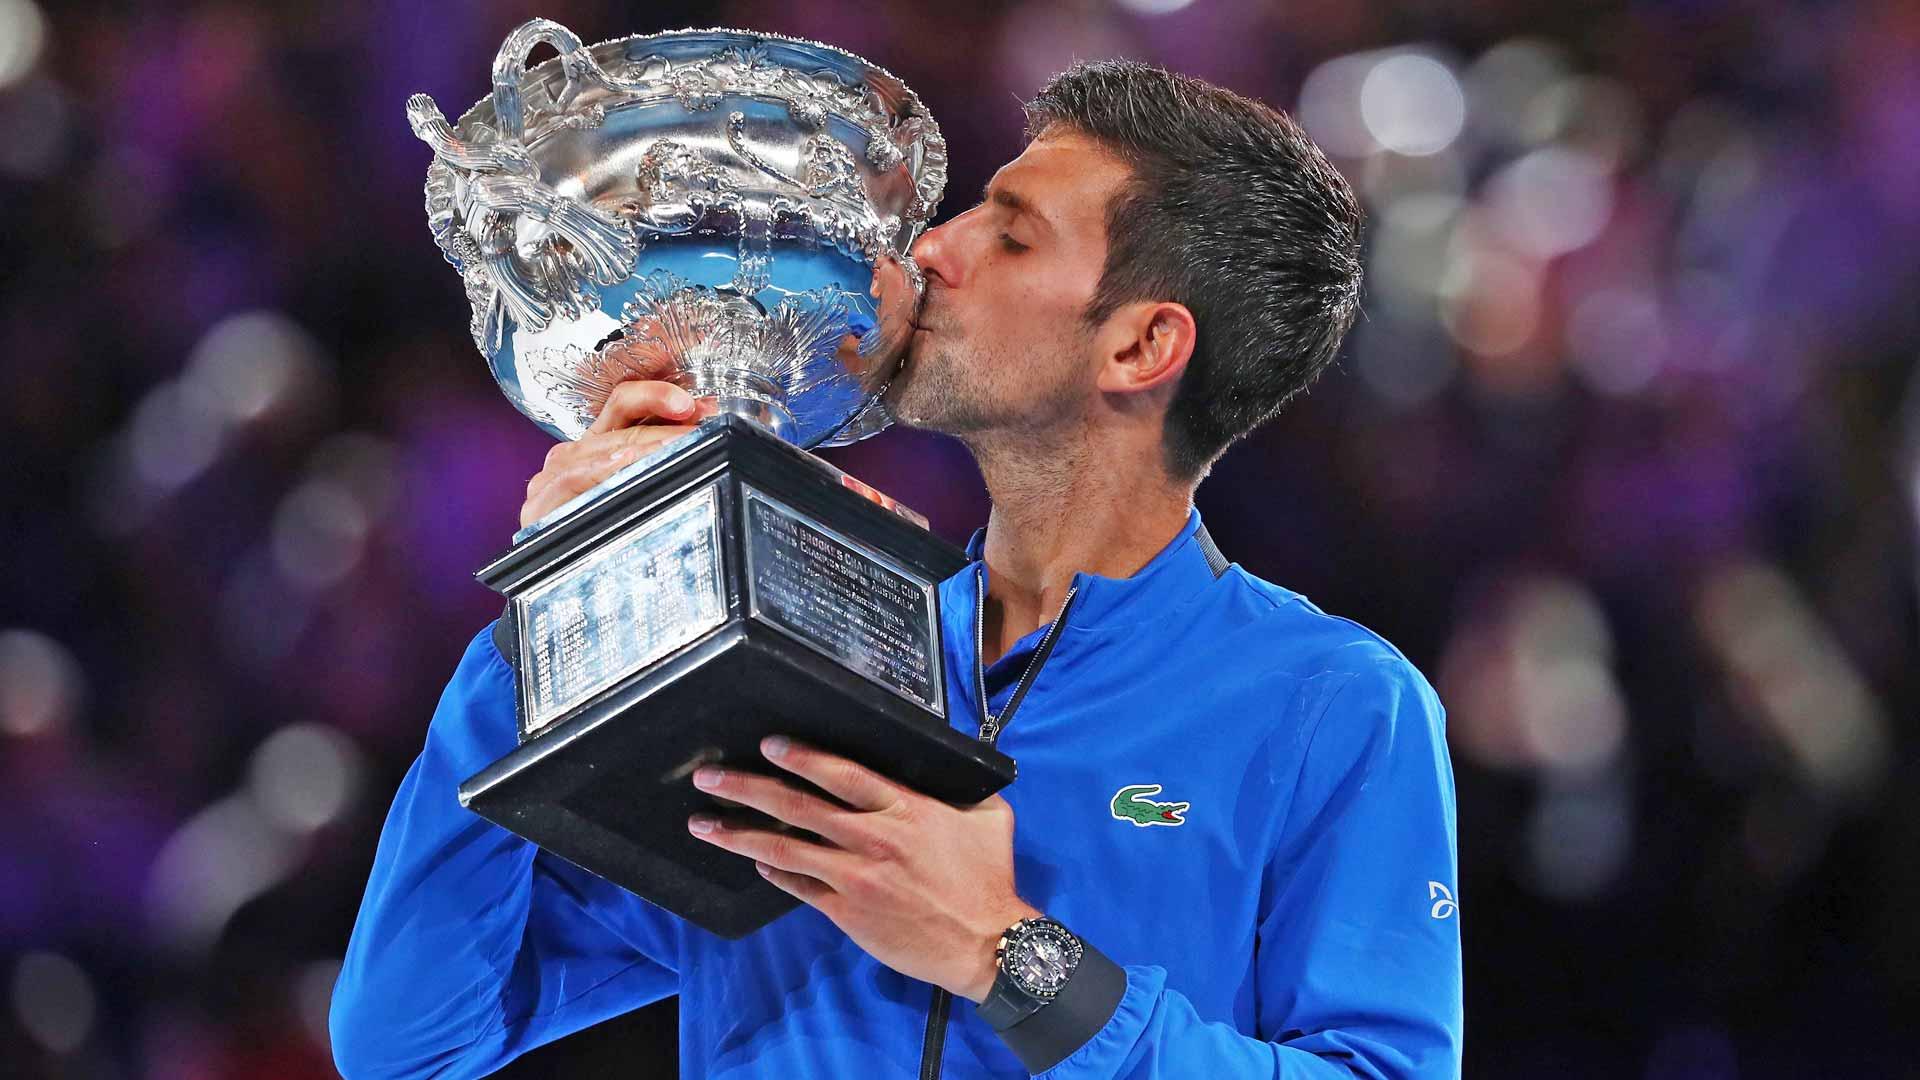 Rafael Nadal Novak Djokovic Roger Federer Lead The Way At 2020 Australian Open When Is The Draw More Atp Tour Tennis